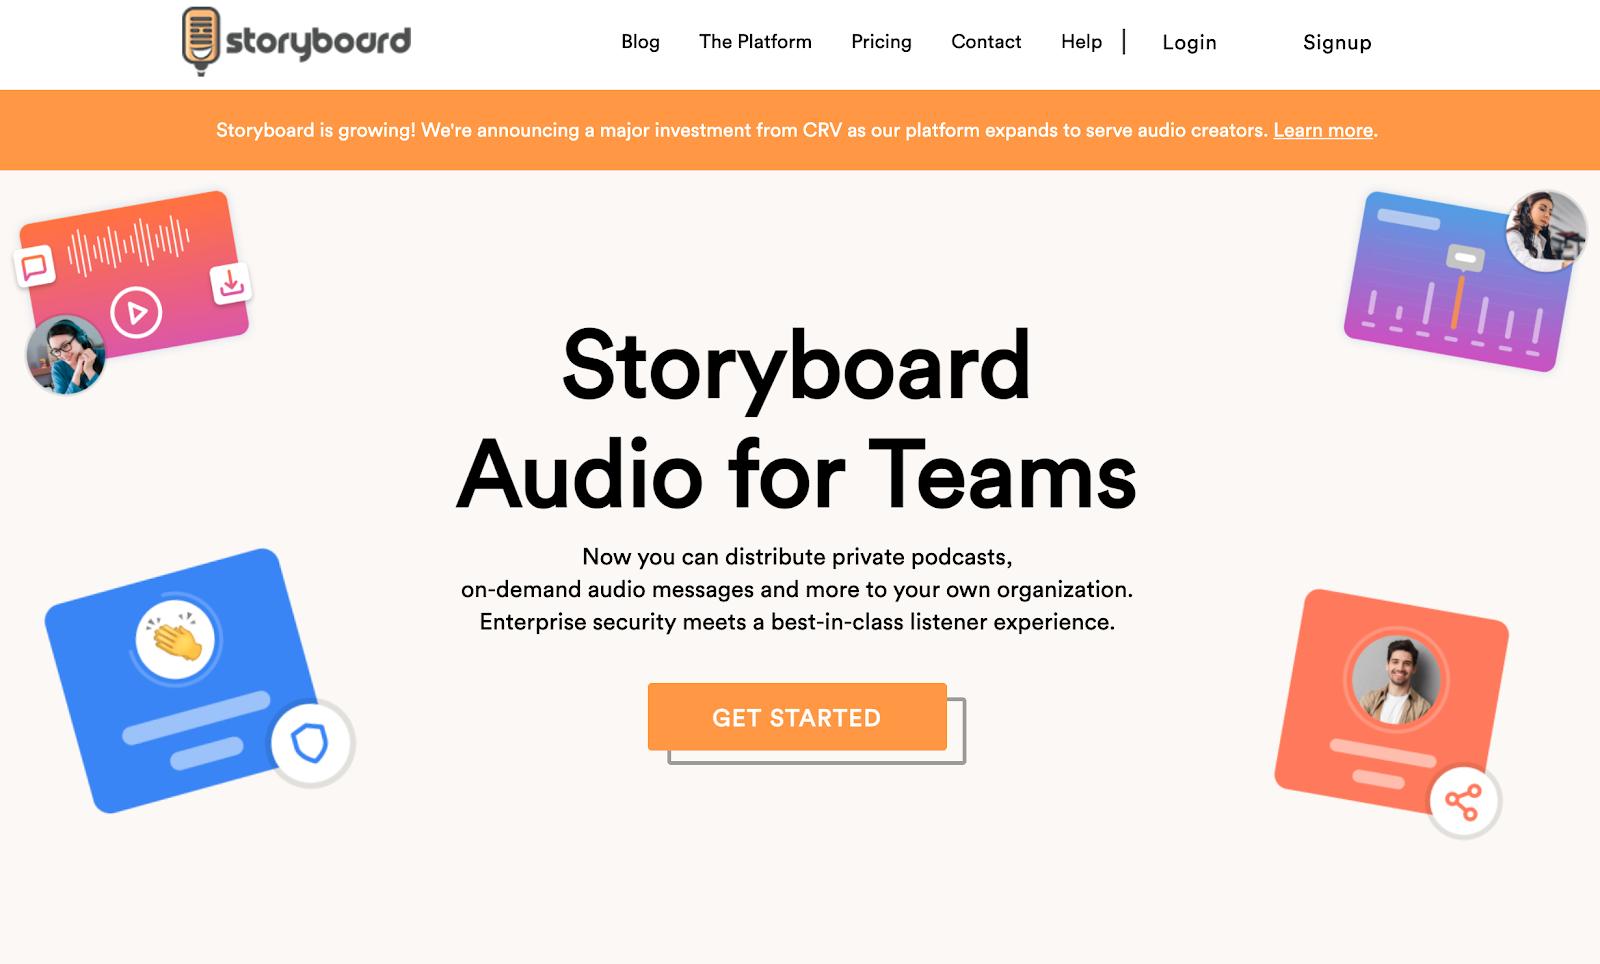 Storyboard landing page